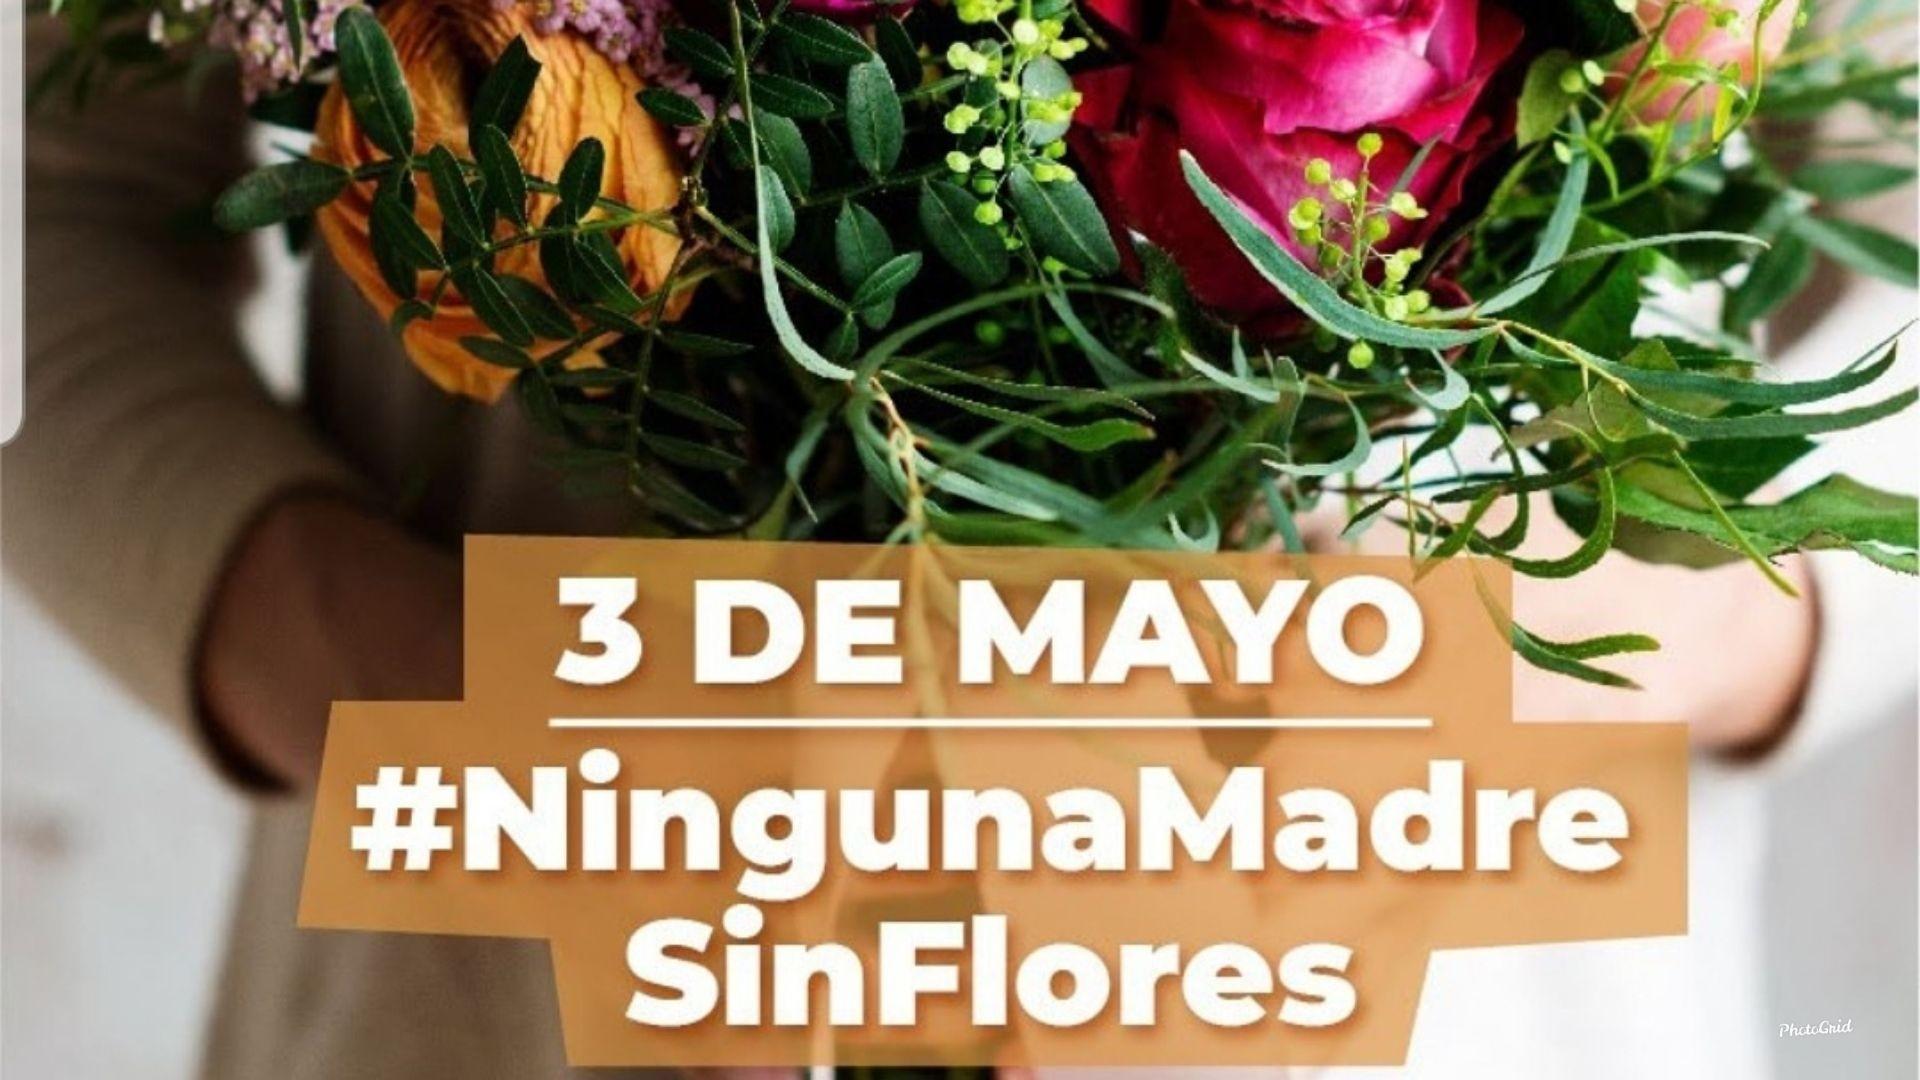 3de Mayo #NingunaMadreSinFlores